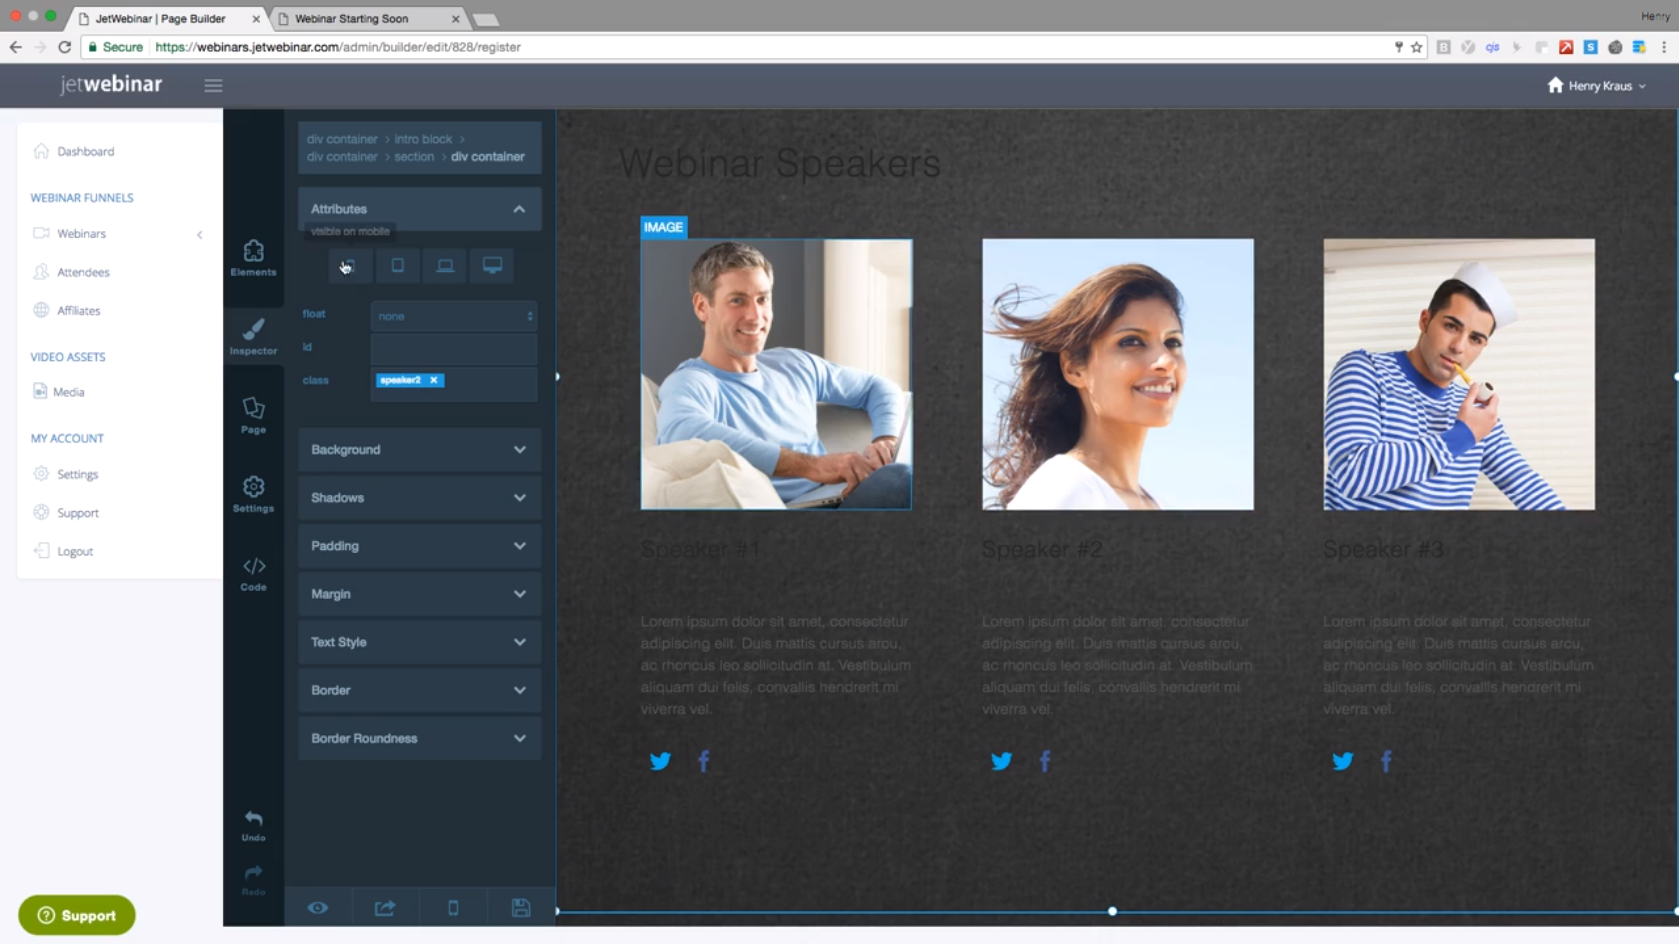 Jet Webinar Drag and Drop Editor - Your Webinar Experts